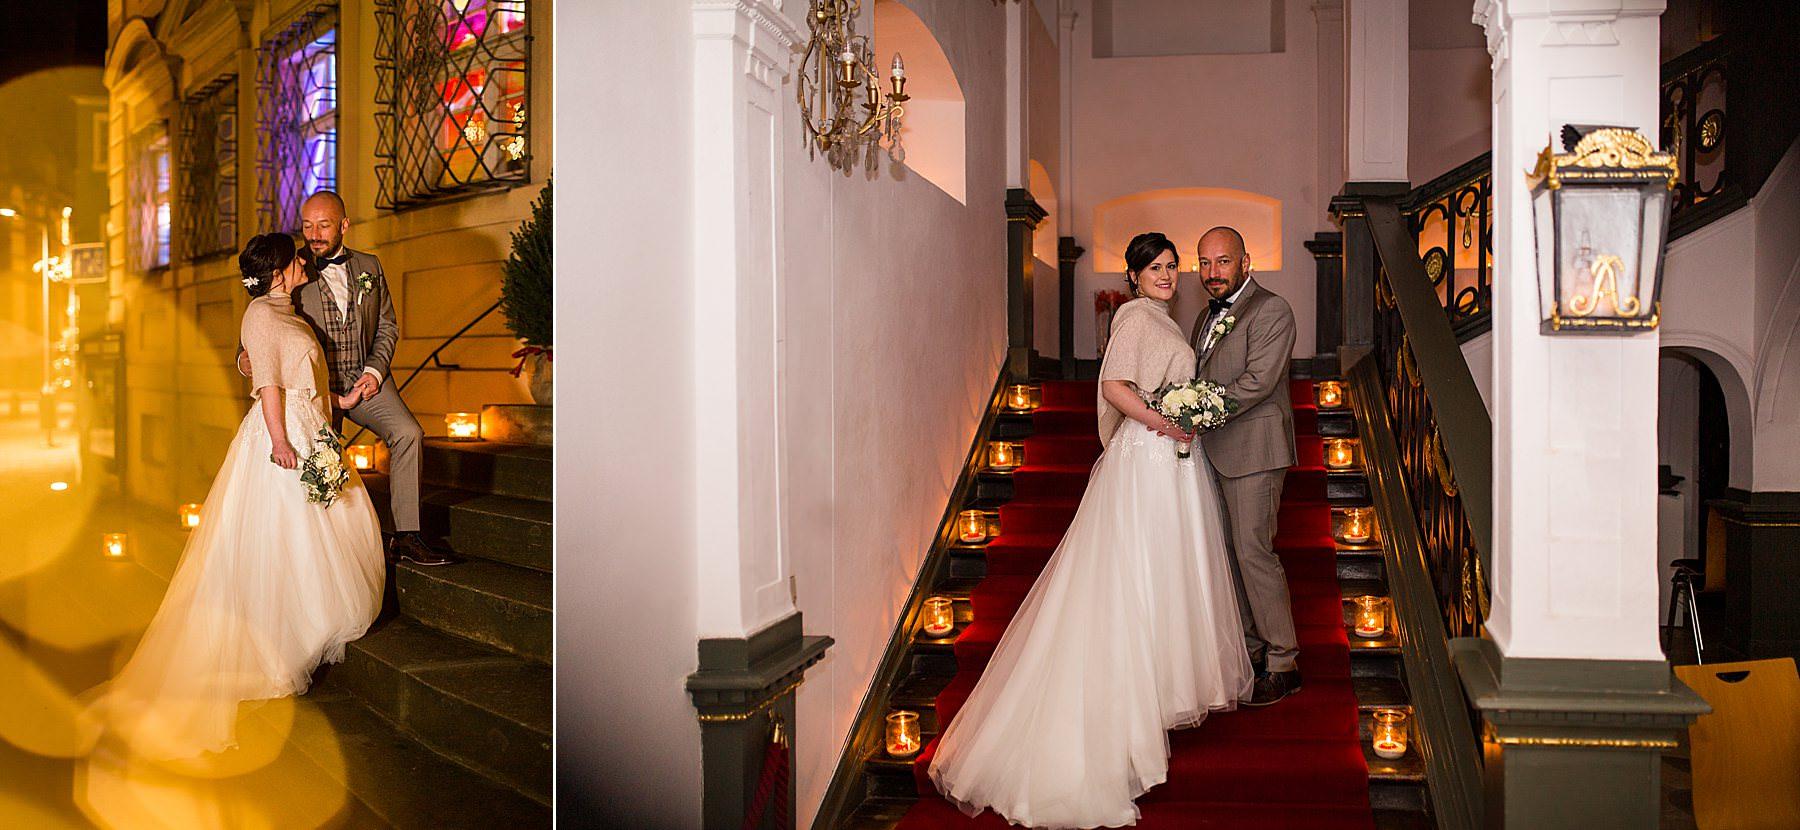 Romantische Candle-Light-Trauung im Palais Adelmann